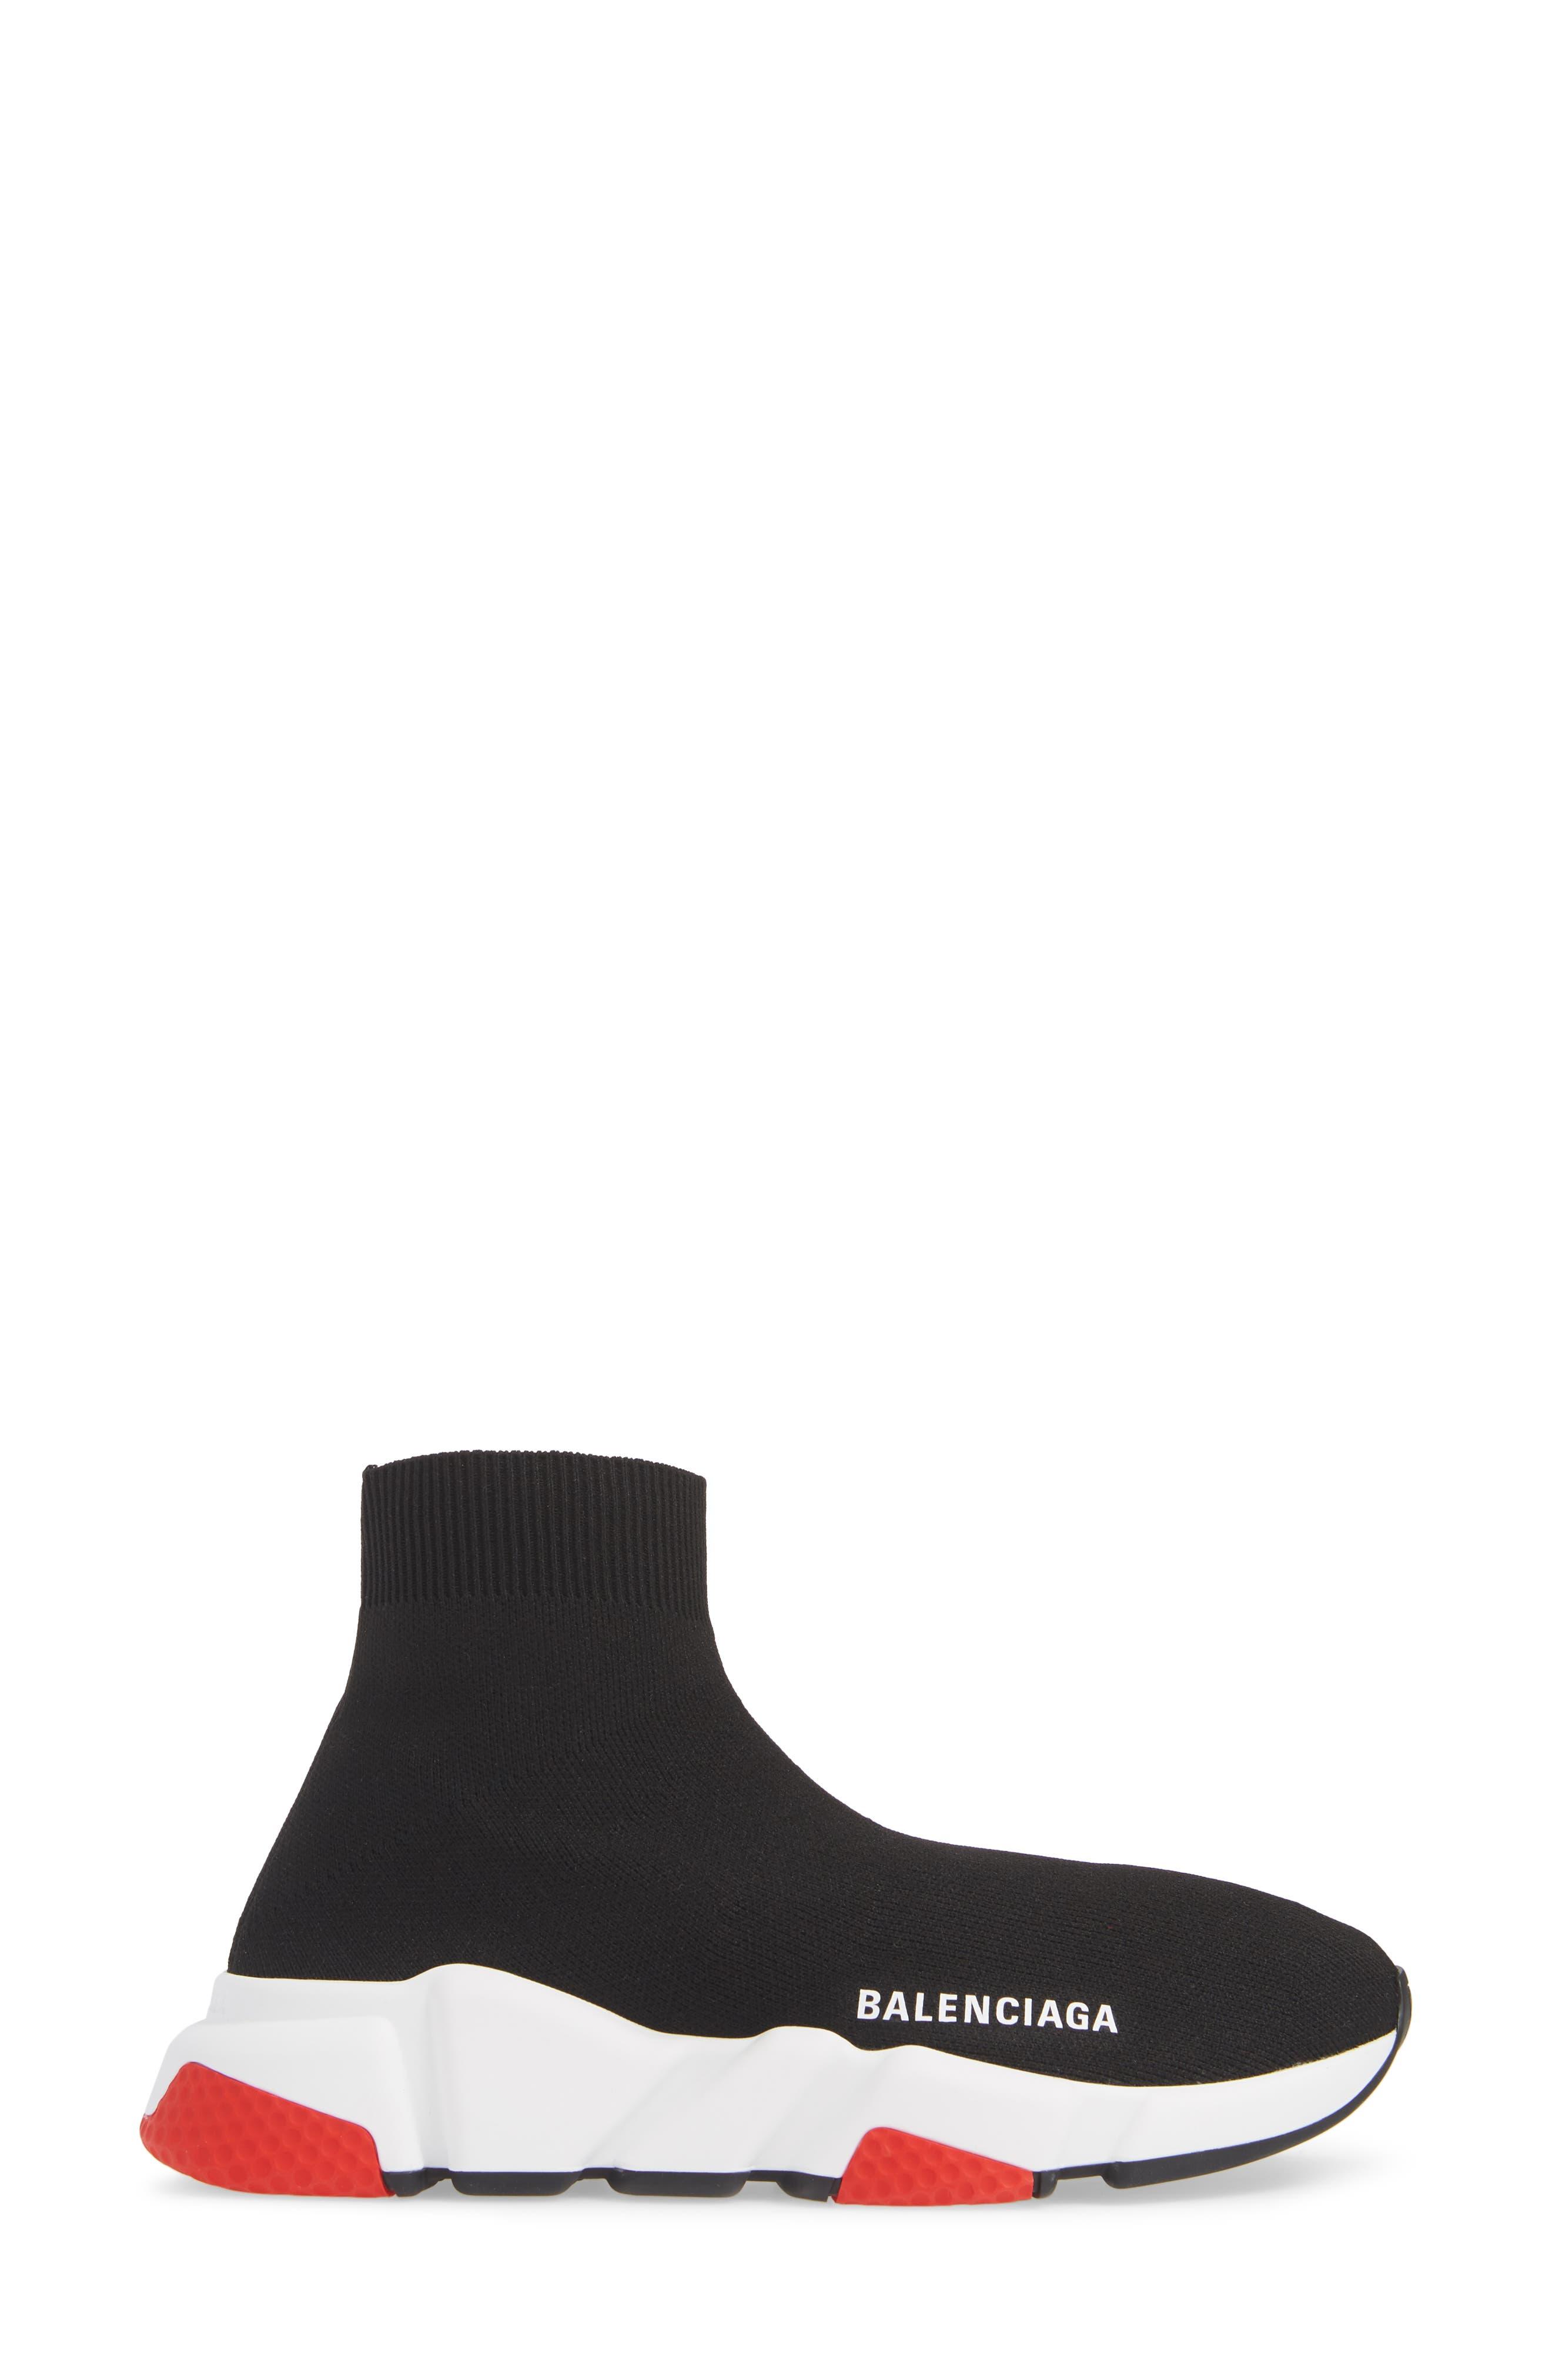 BALENCIAGA, Speed Knit Sneaker, Alternate thumbnail 3, color, BLACK/ RED